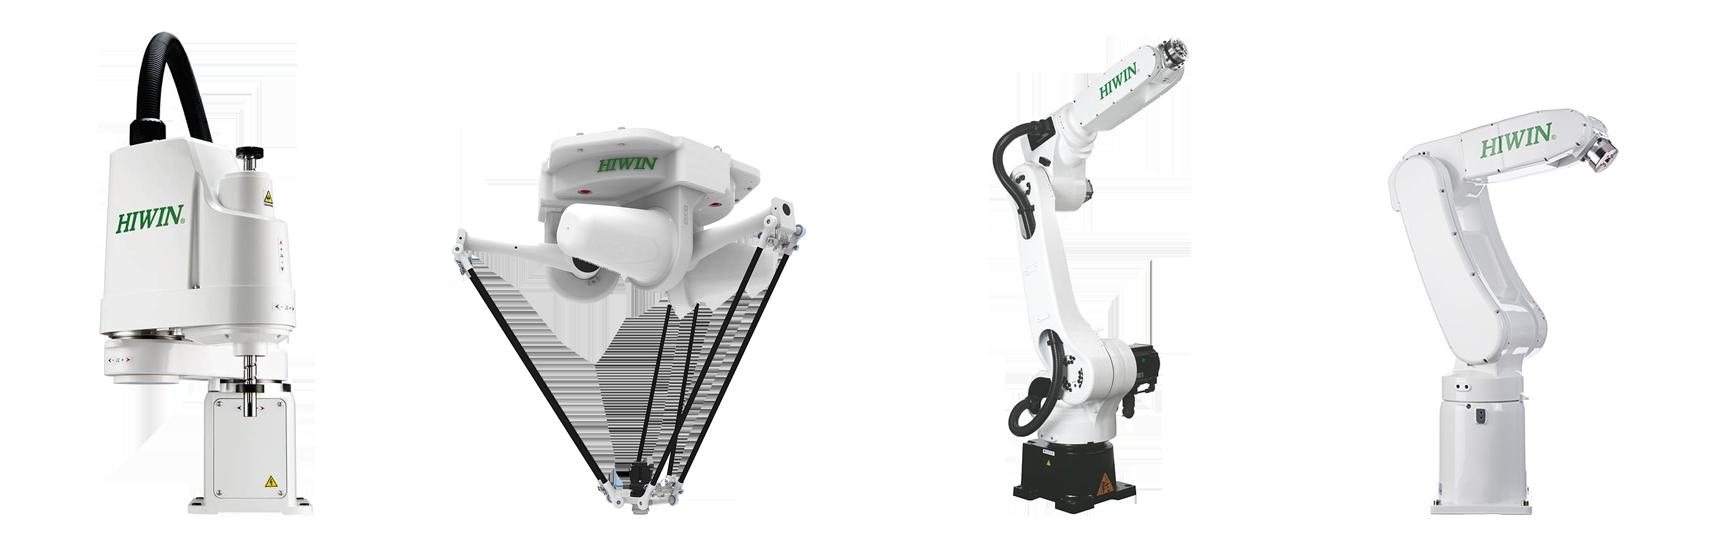 robotss.png